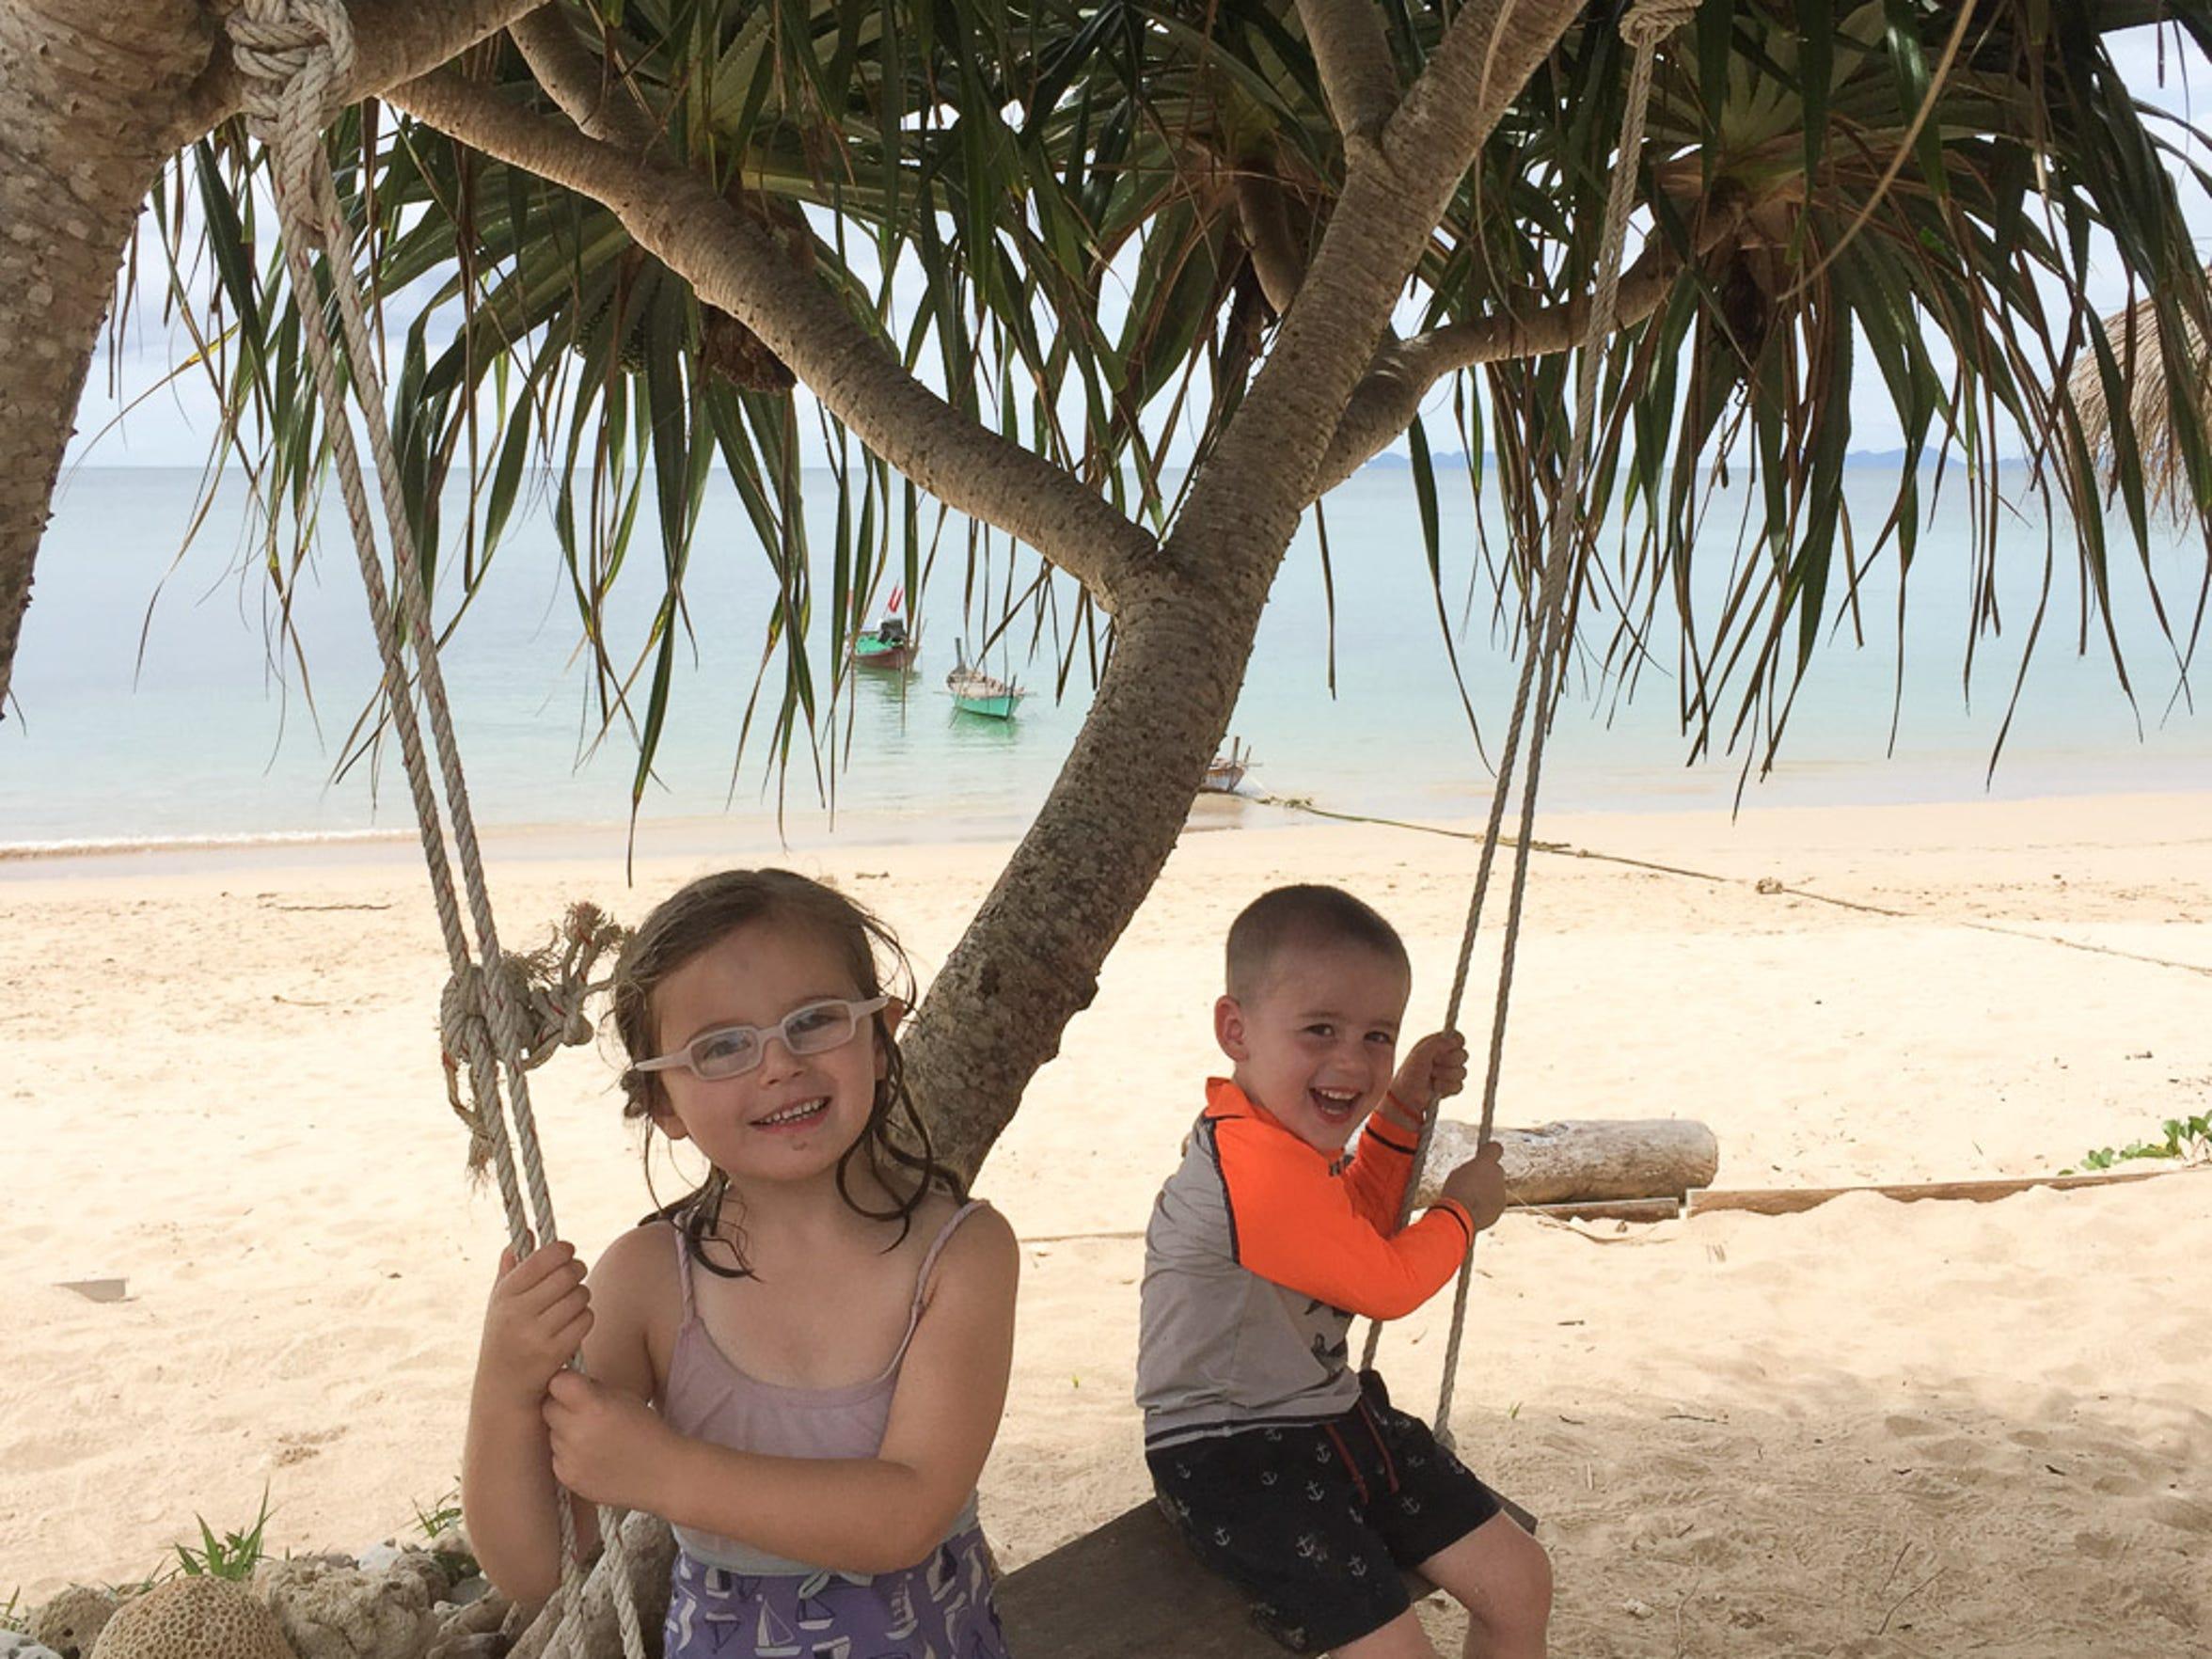 Harper and Walker Hughey playing in Ko Lanta, Thailand.